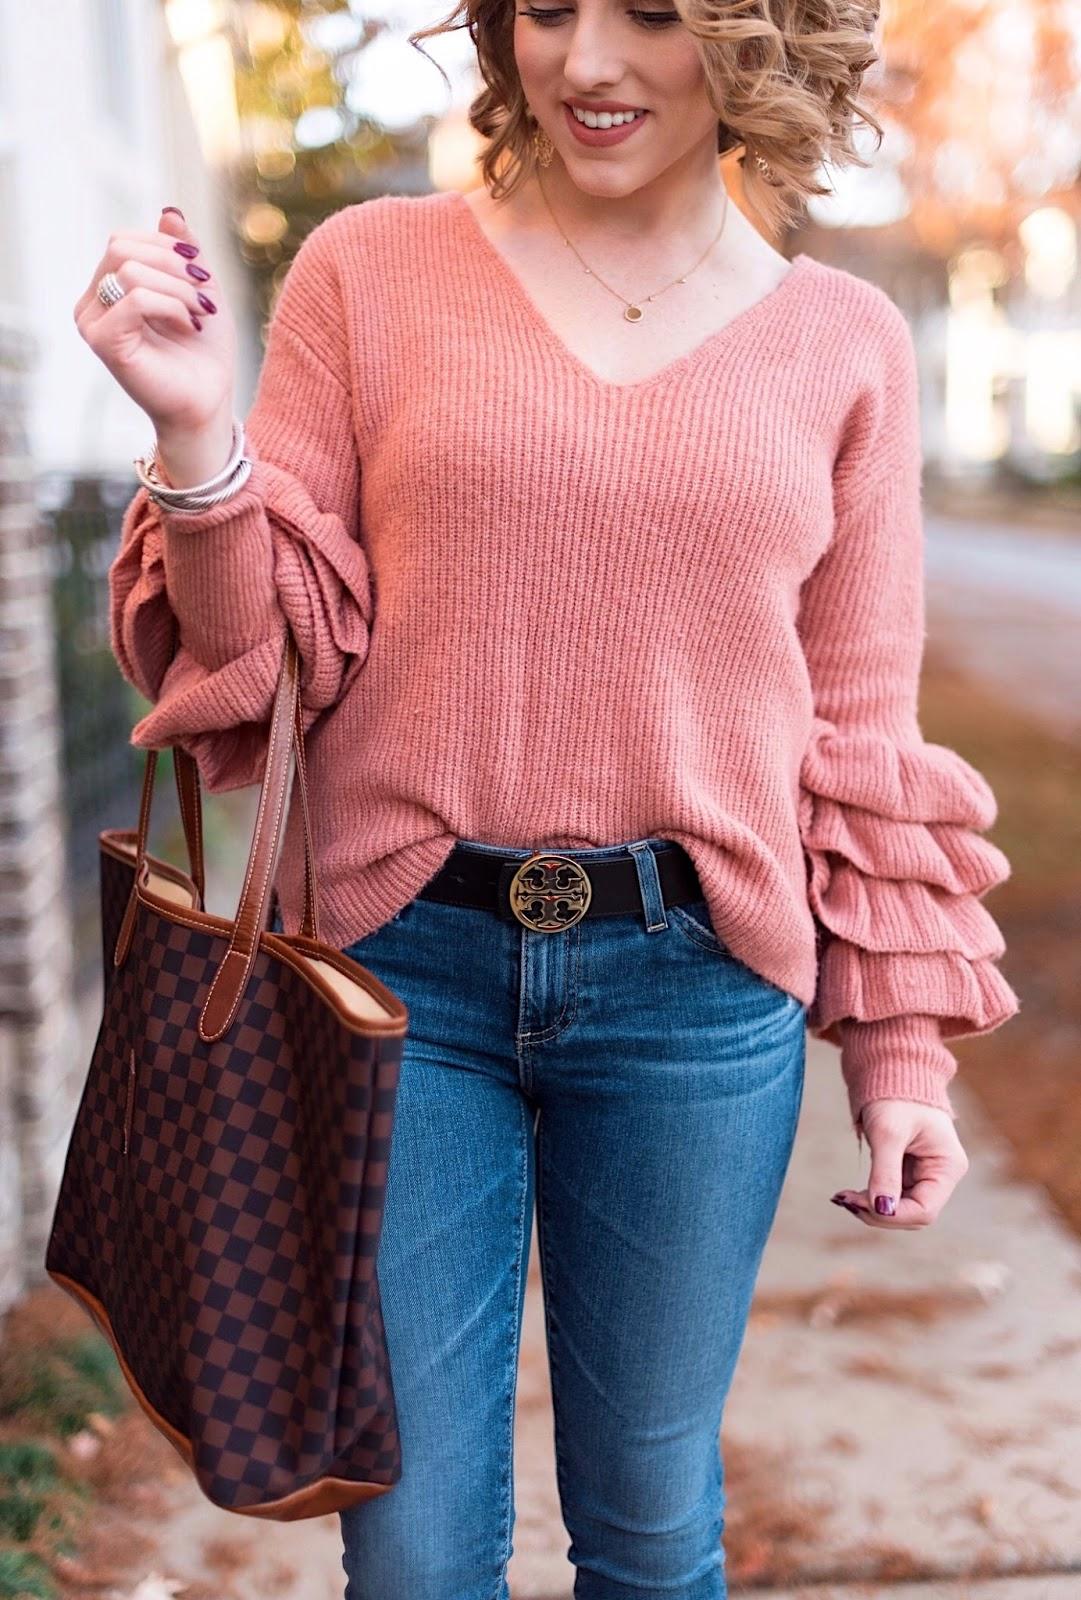 Tiered Ruffle Sleeve Sweater - Something Delightful Blog